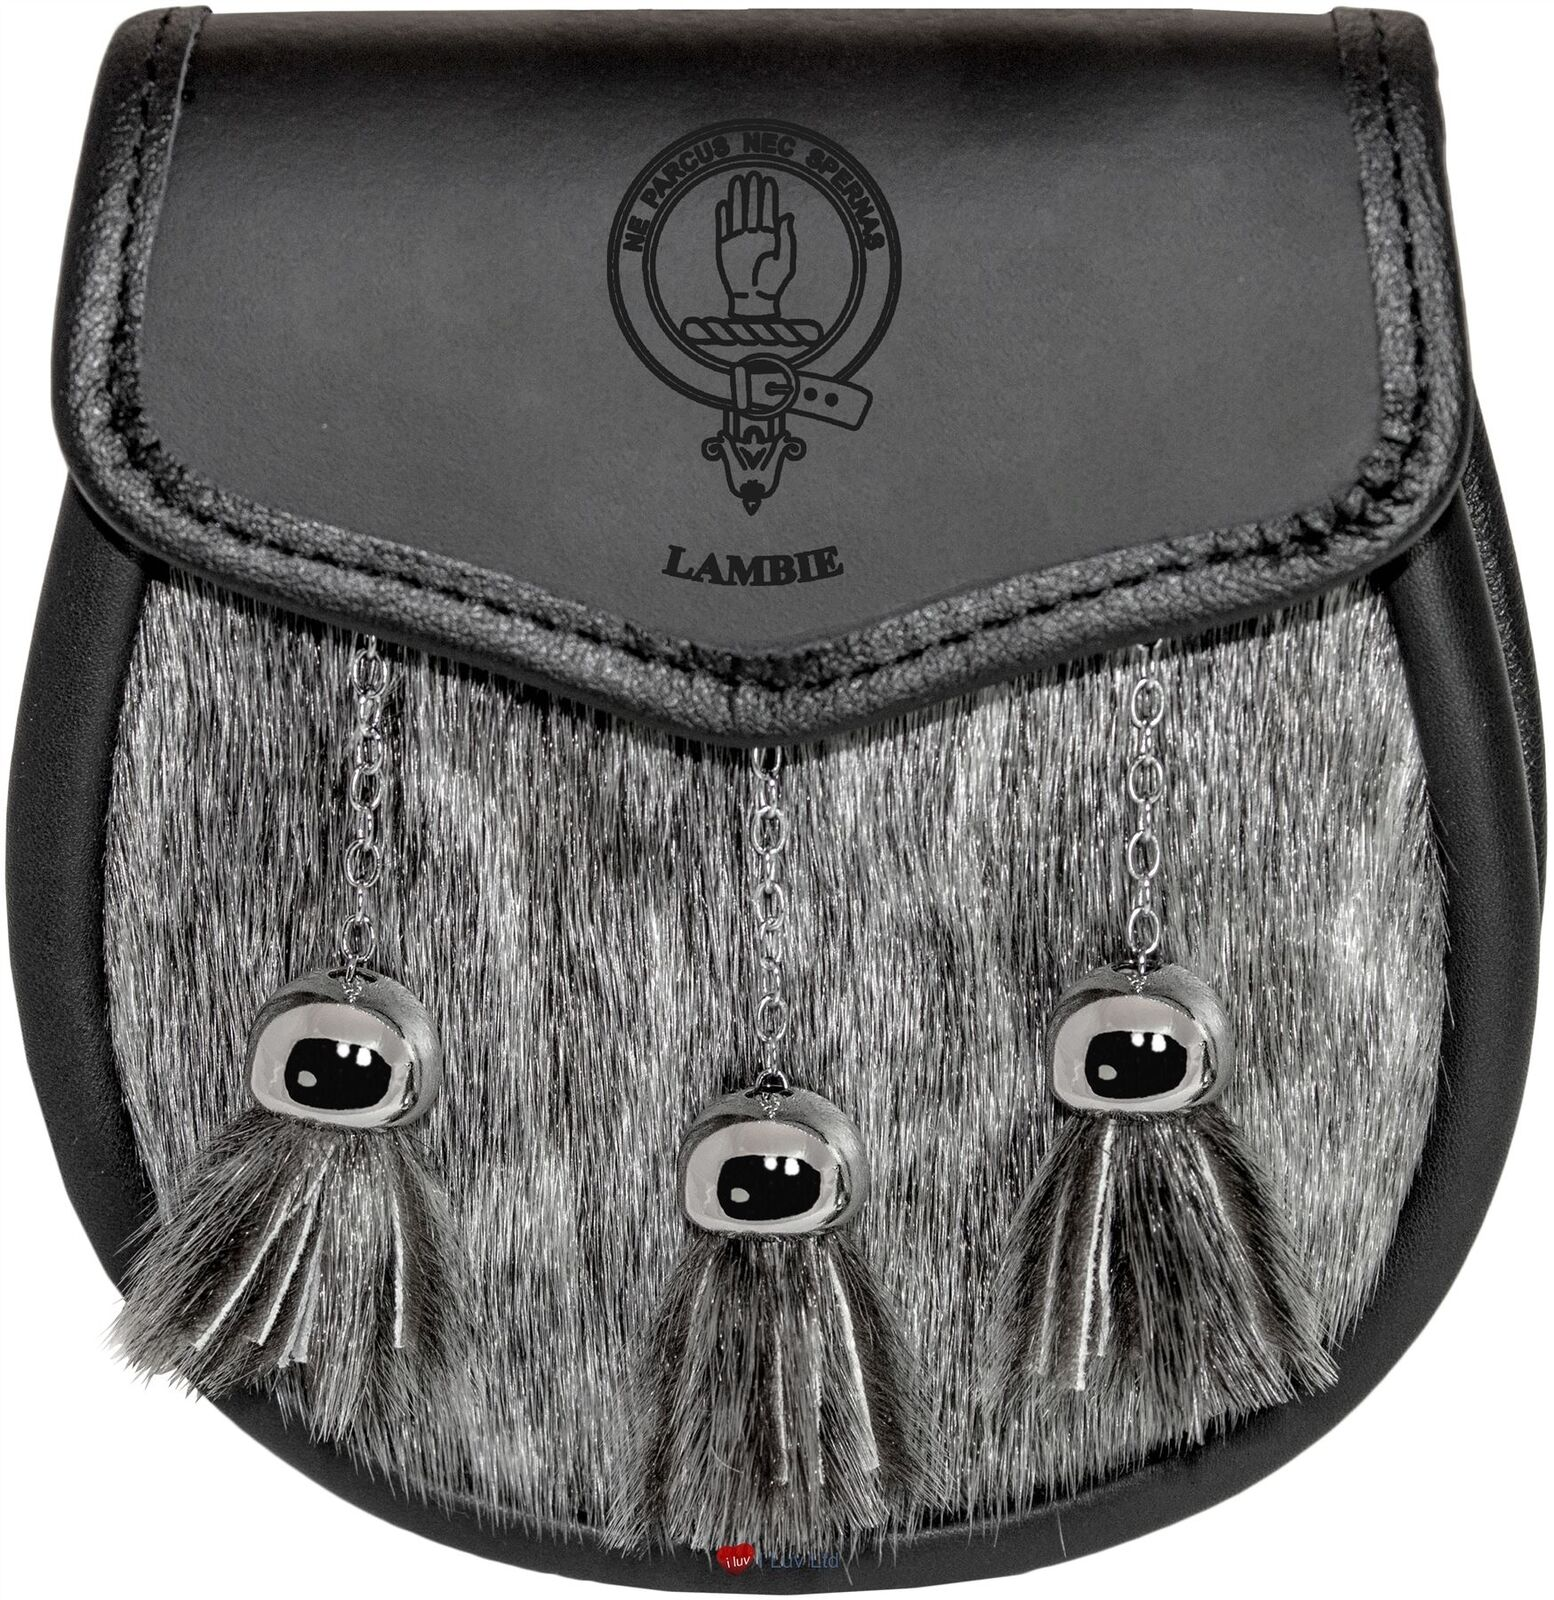 Lambie Semi Dress Sporran Fur Plain Leather Flap Scottish Clan Crest